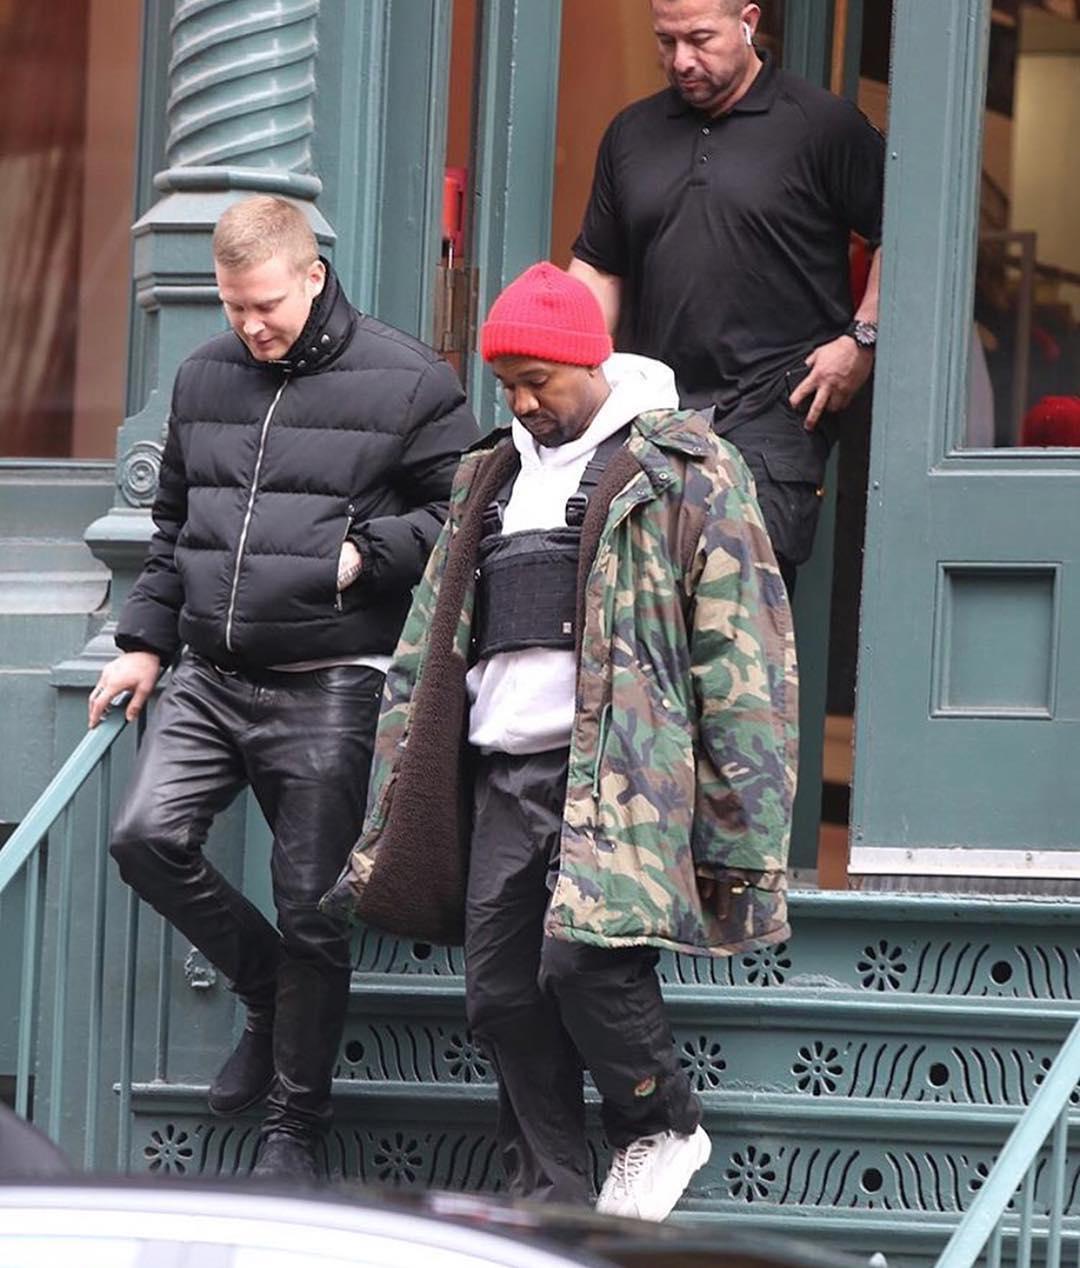 Yeezy 700,Yeezy  侃爷上脚 Yeezy 新鞋,他最近都格外青睐这样的穿搭…